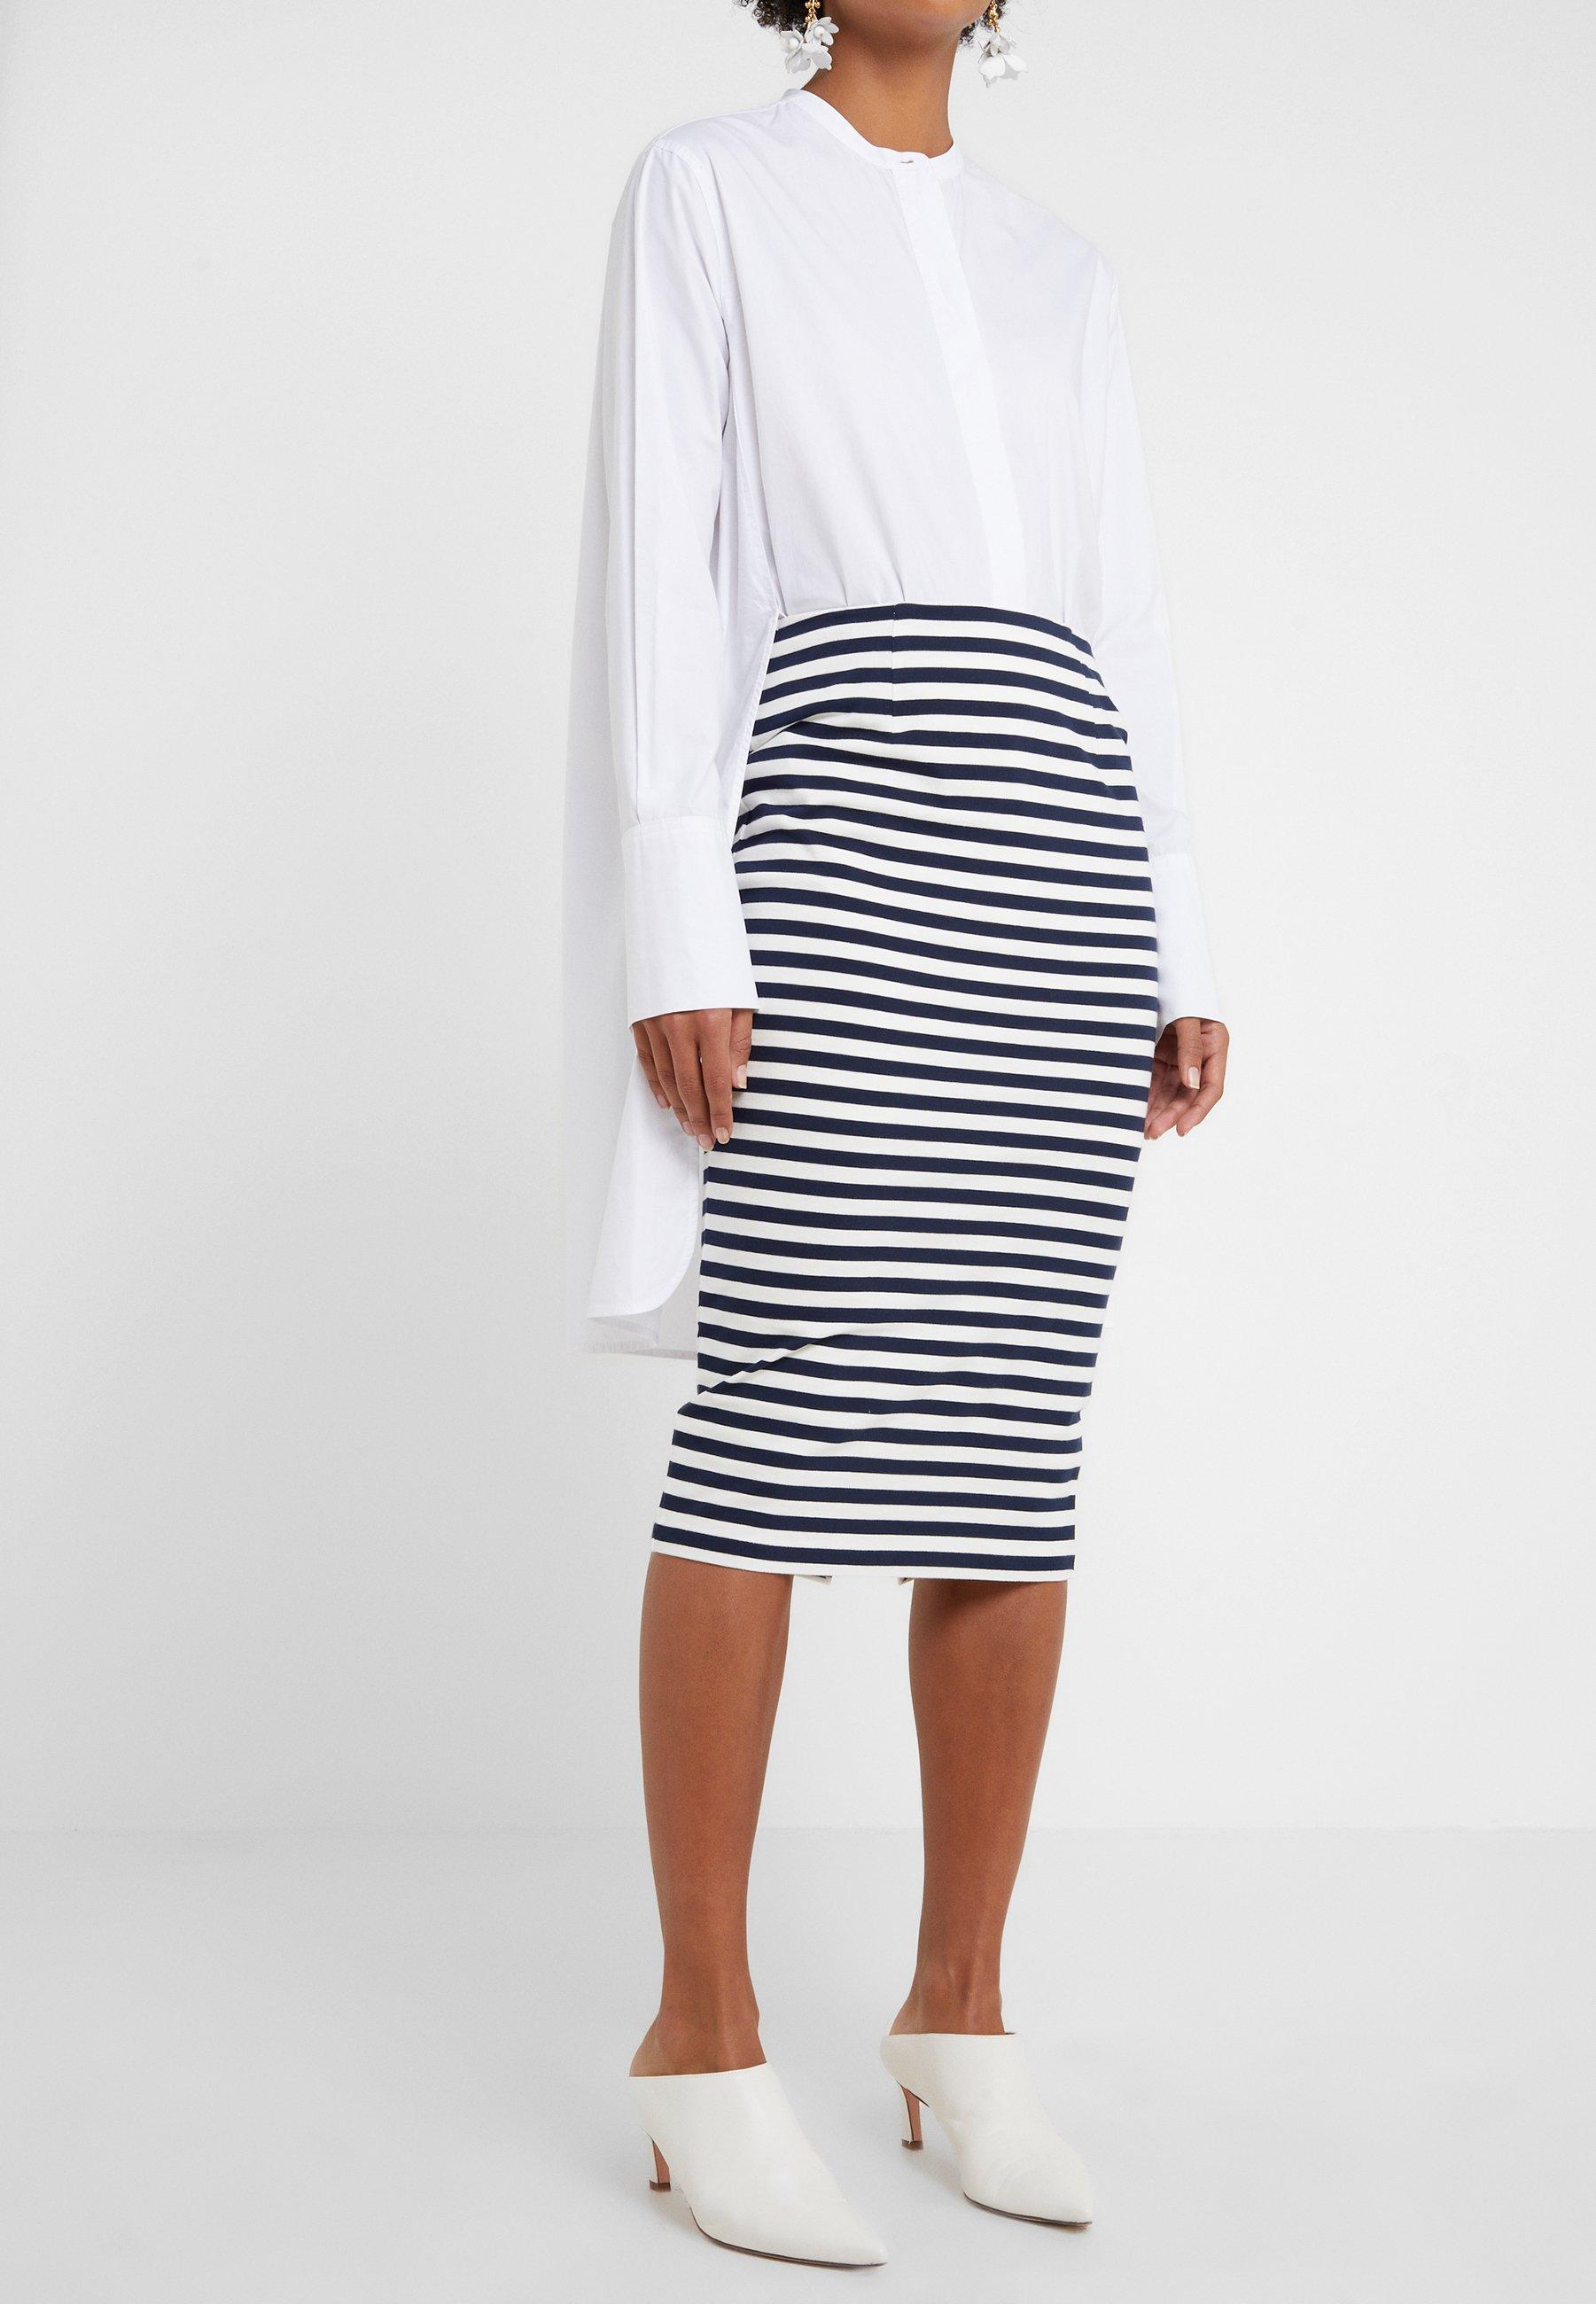 Factory Price Largest Supplier Women's Clothing J.CREW Pencil skirt cabo stripe navy pcbt60fSL qtbgpv5nD